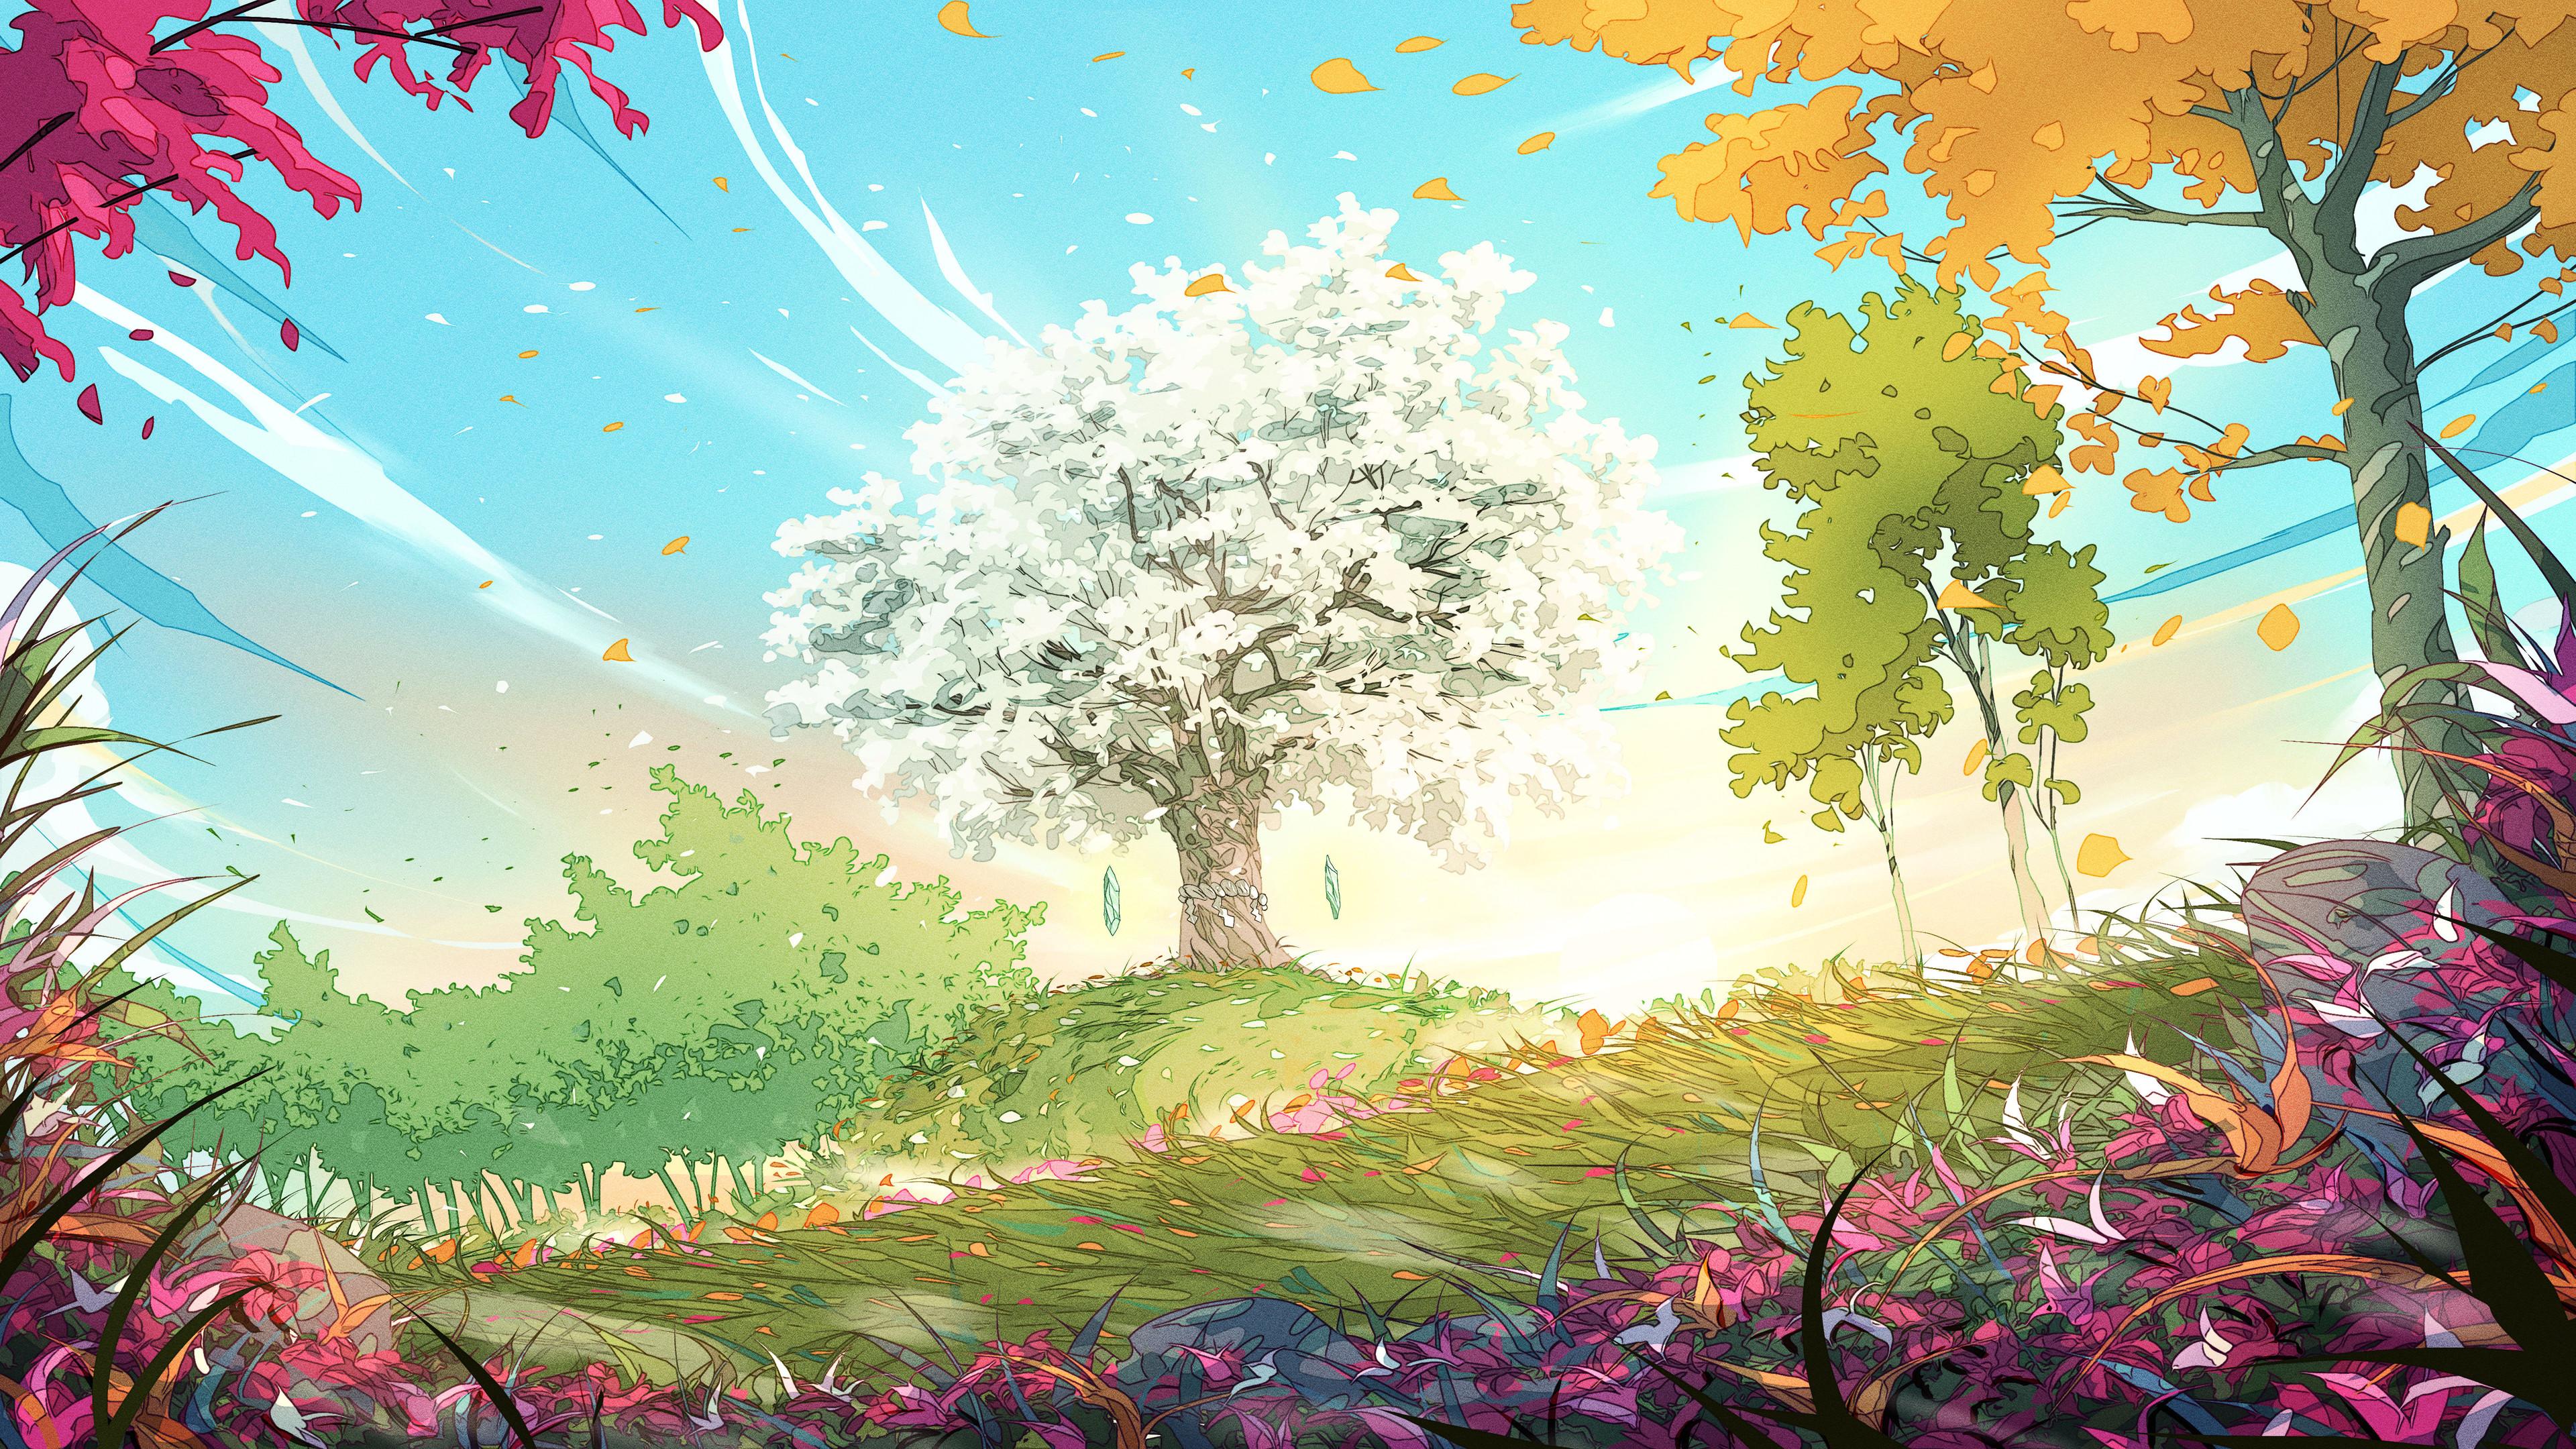 General 3840x2160 colorful trees spring leaves wind grass Christian Benavides digital art crystal  fantasy art windy